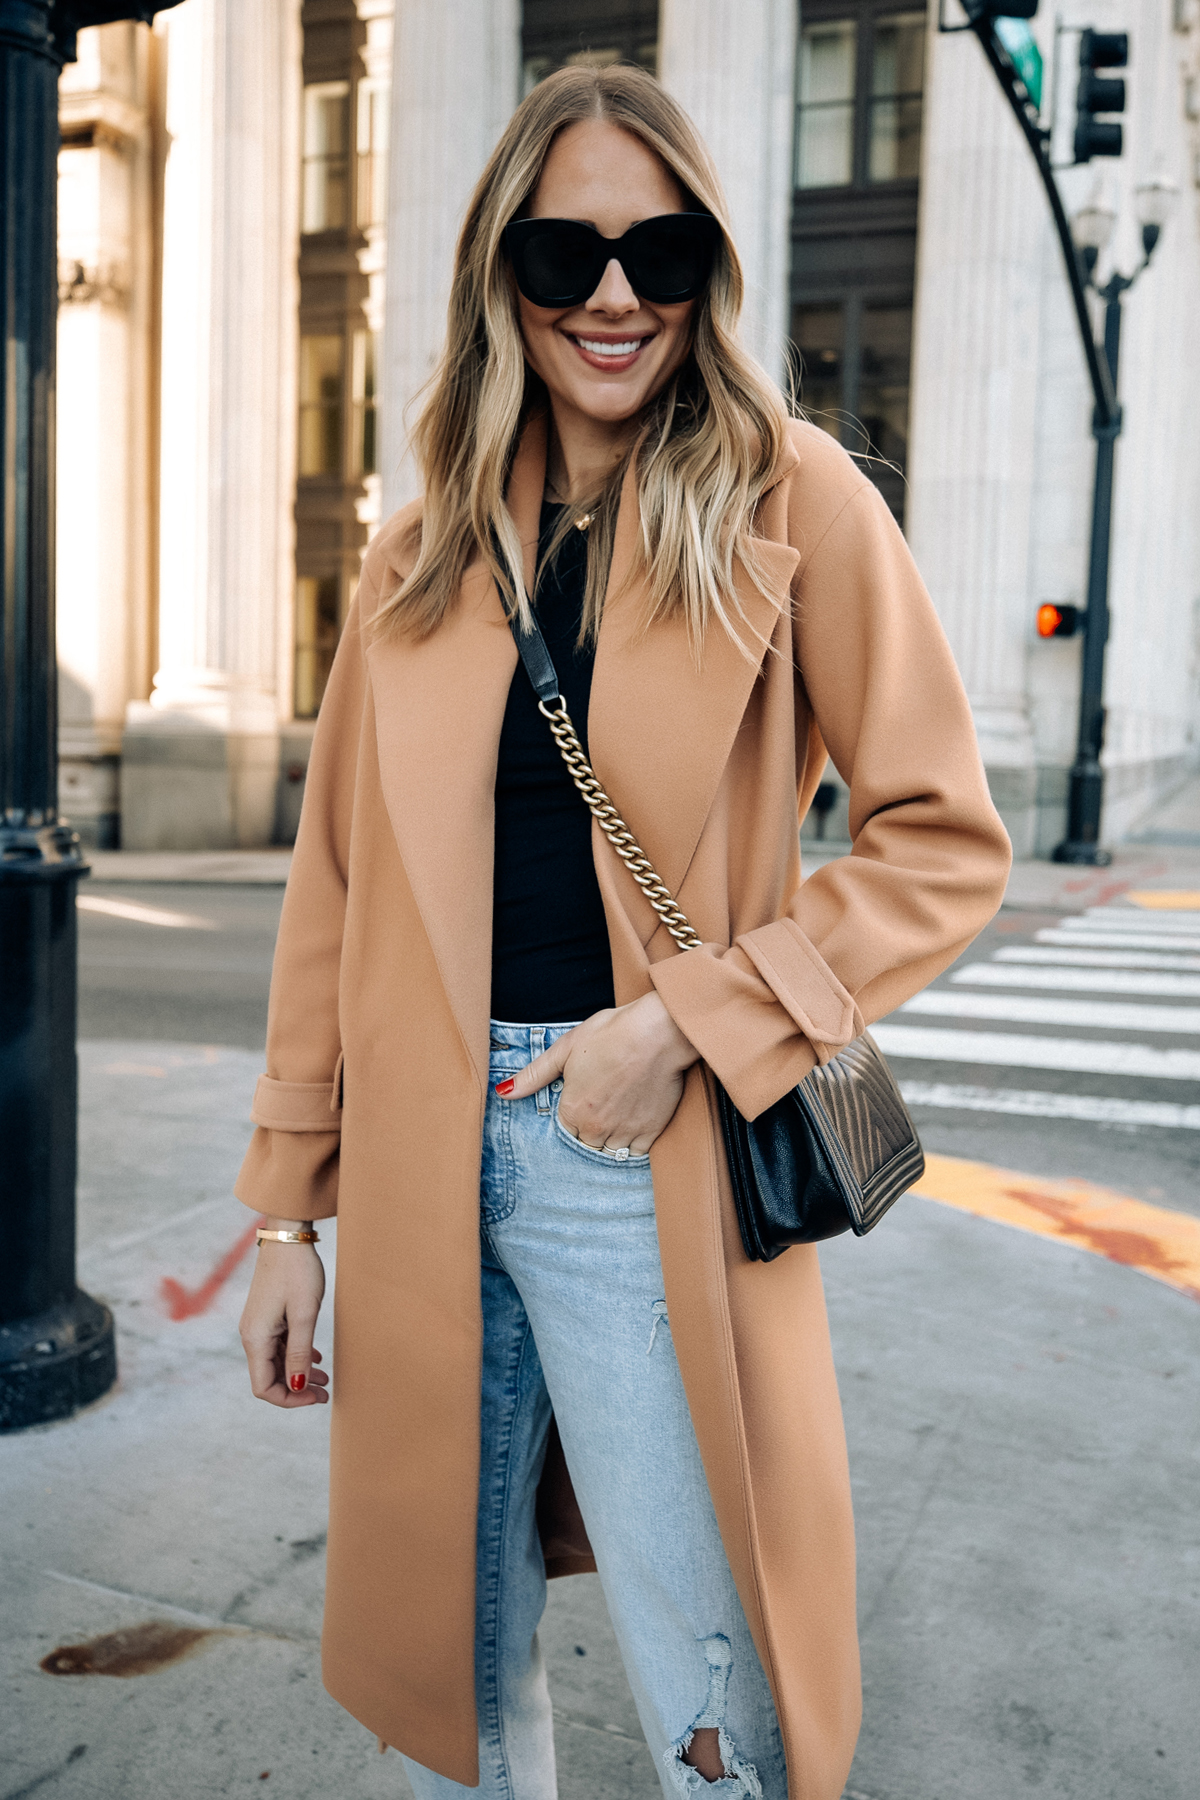 Fashion Jackson Wearing Express Camel Coat Black Tee Ripped Jeans Black Handbag Fall Outfit 1